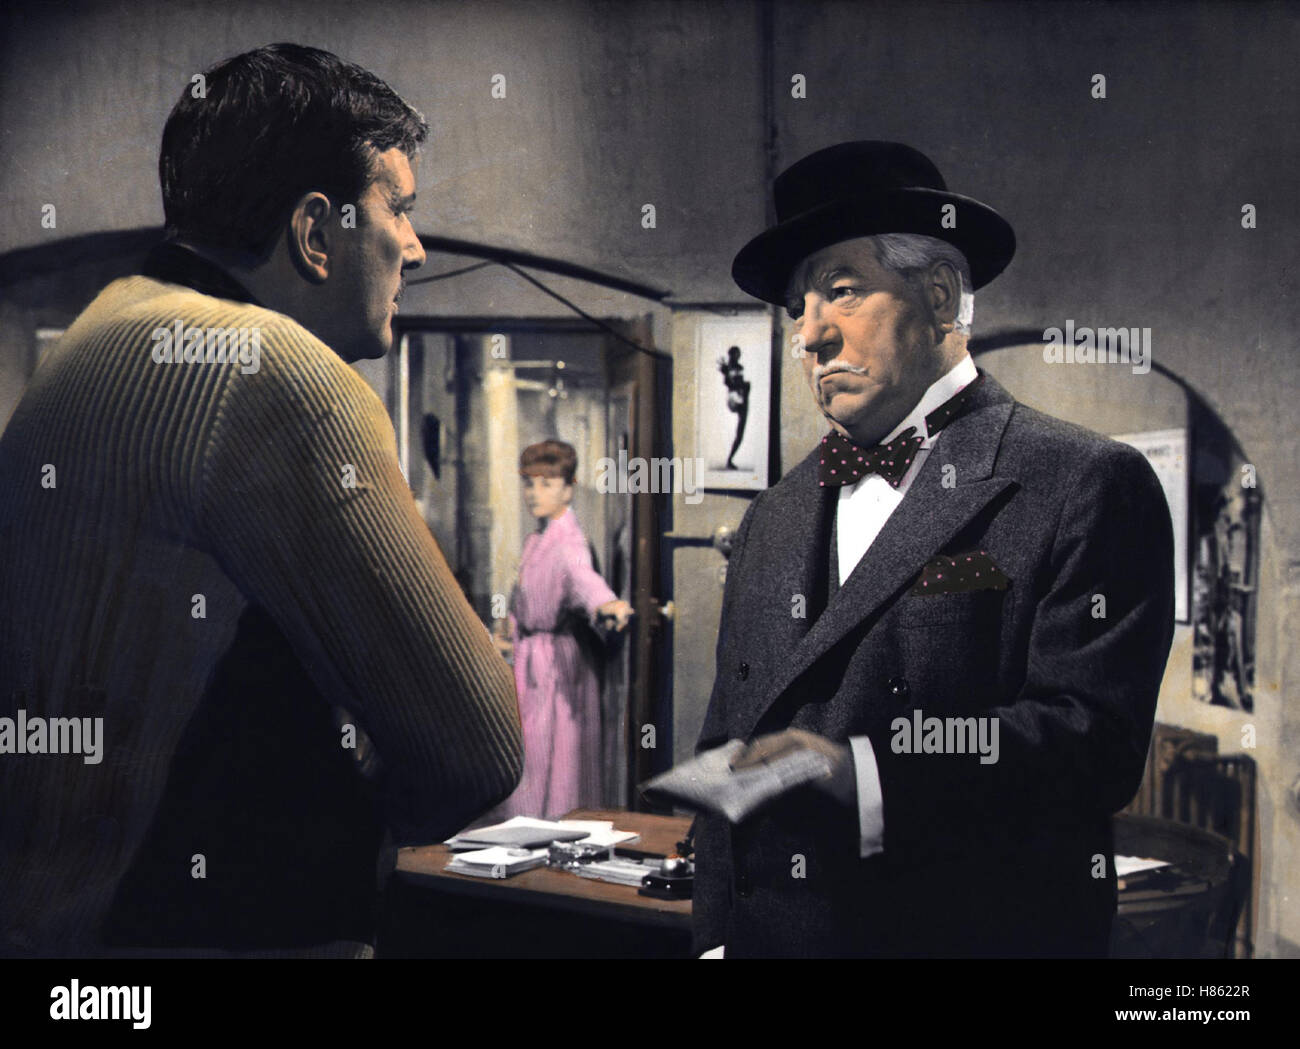 Balduin Das Nachtgespenst Le Tatoue F It 1968 Regie Denys De La Stock Photo Alamy